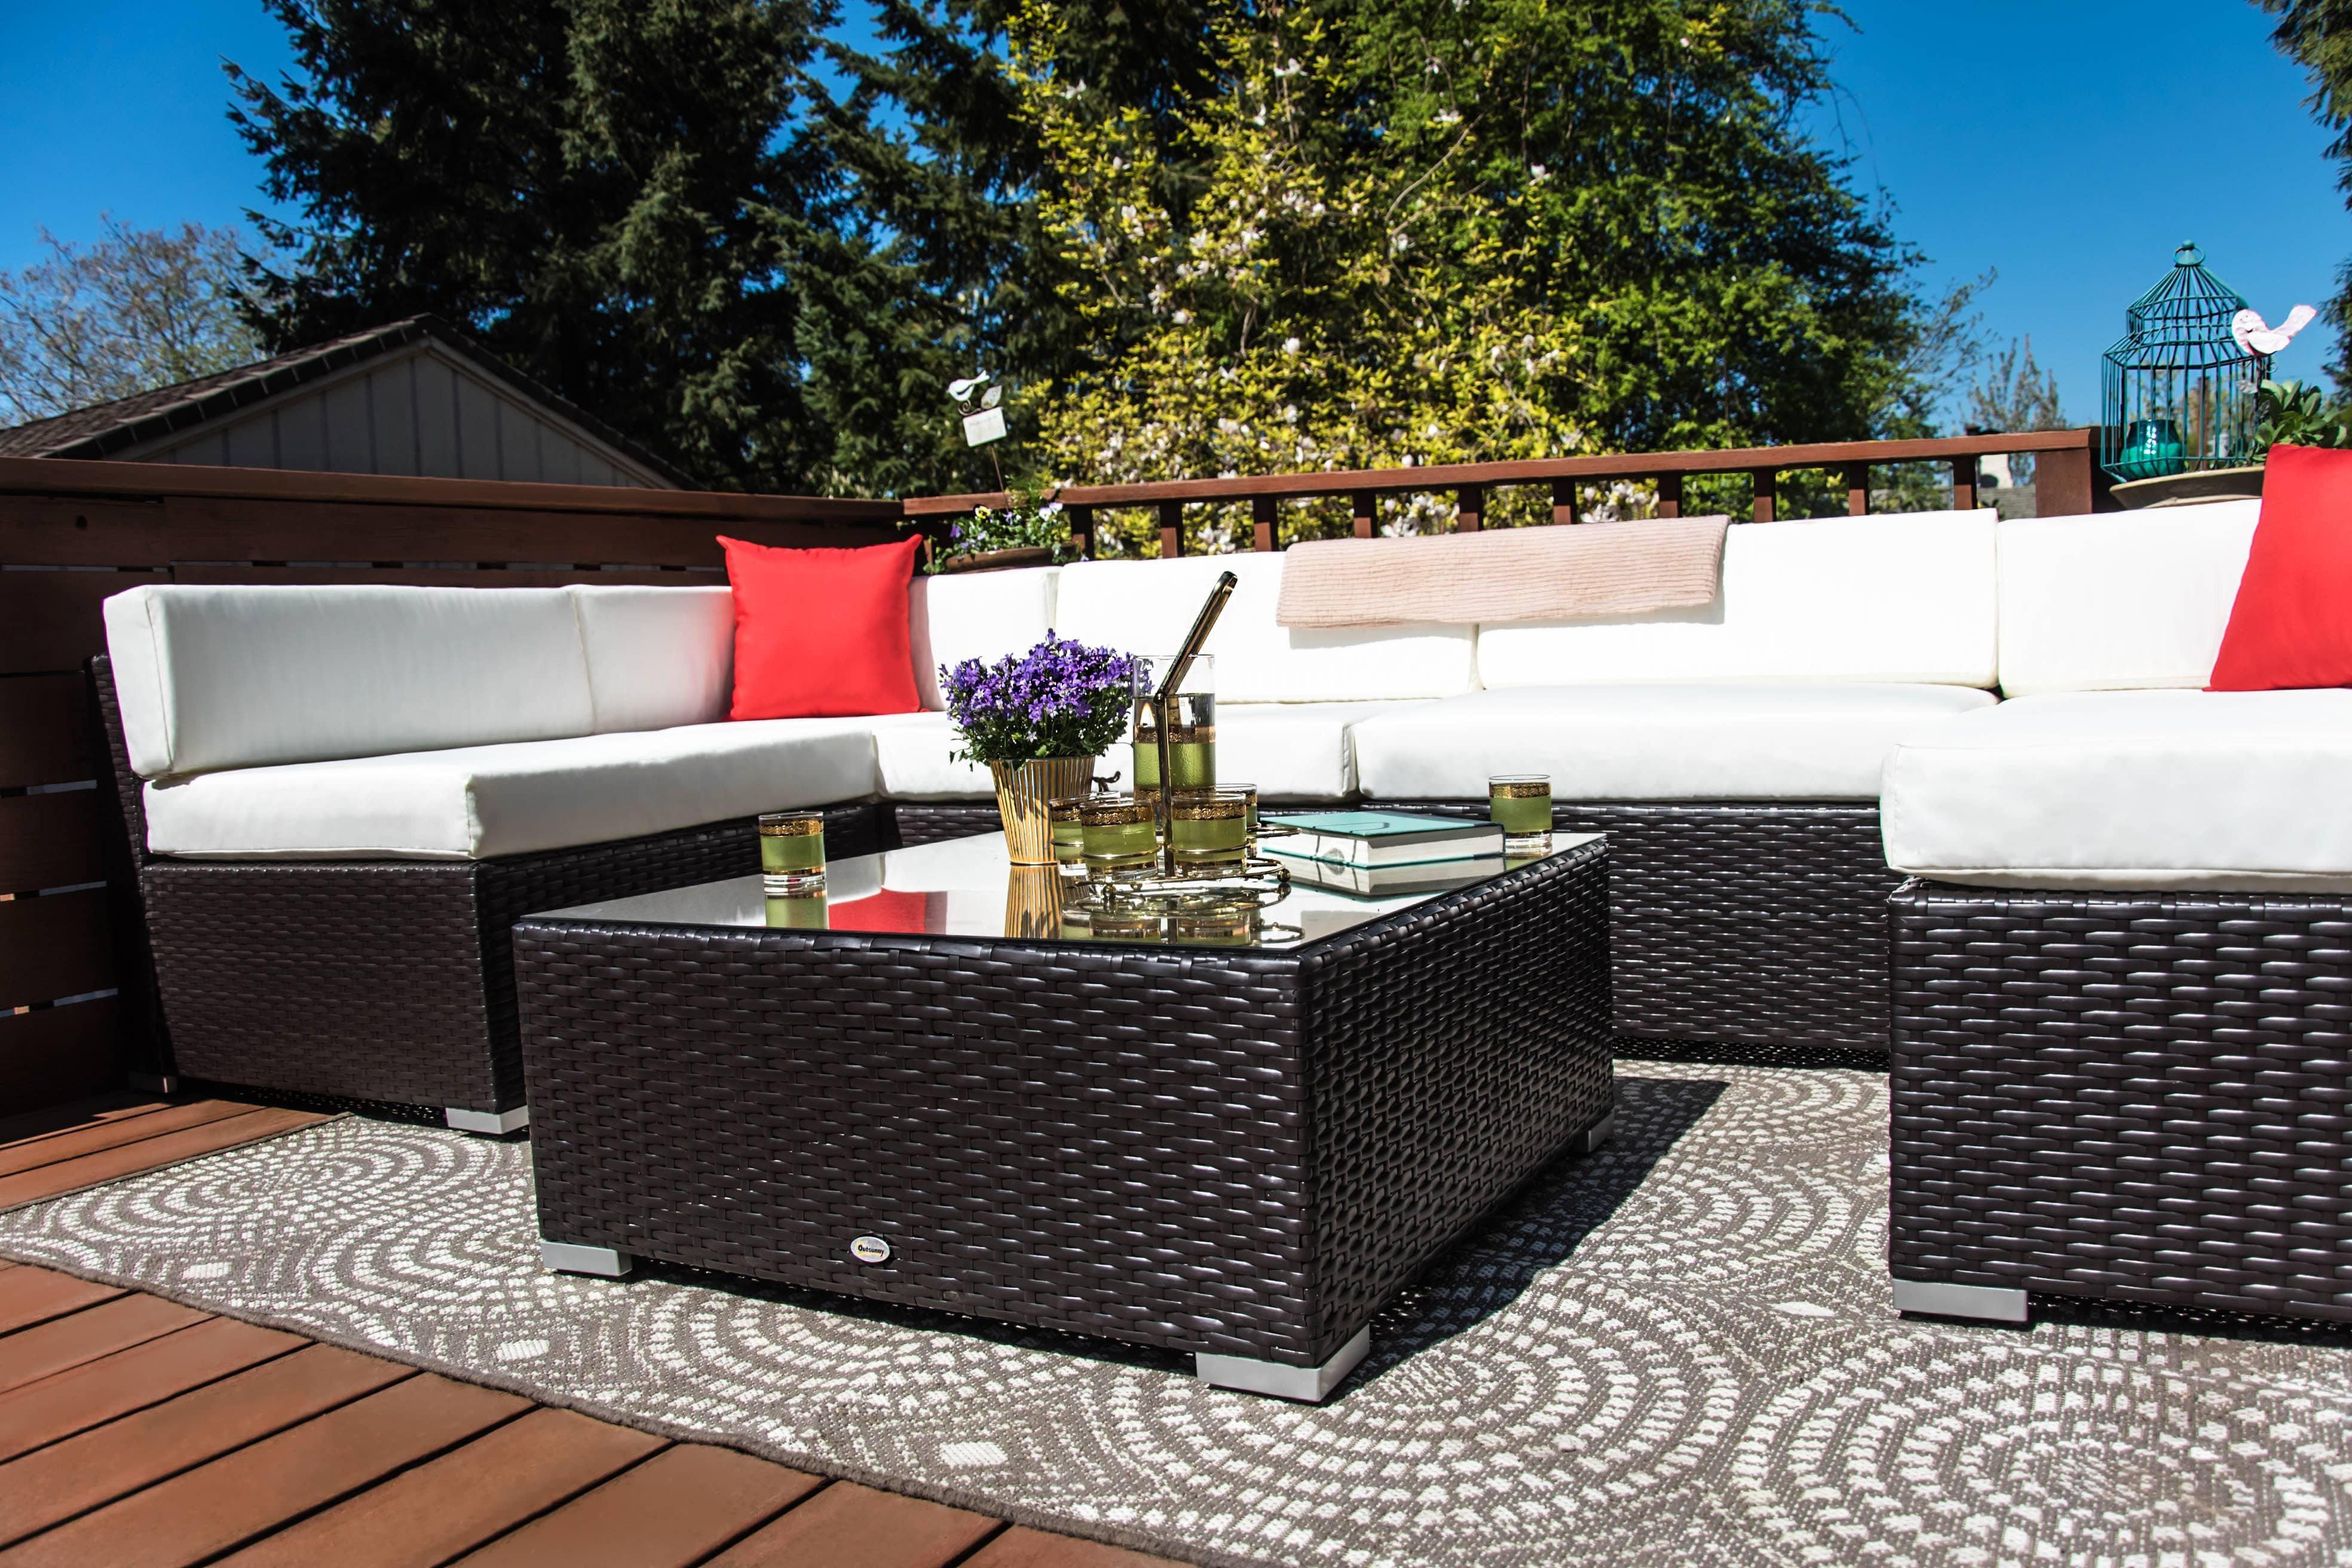 Outsunny 7 Piece Outdoor Patio Rattan Wicker Sofa Sectional Set - Cream 2